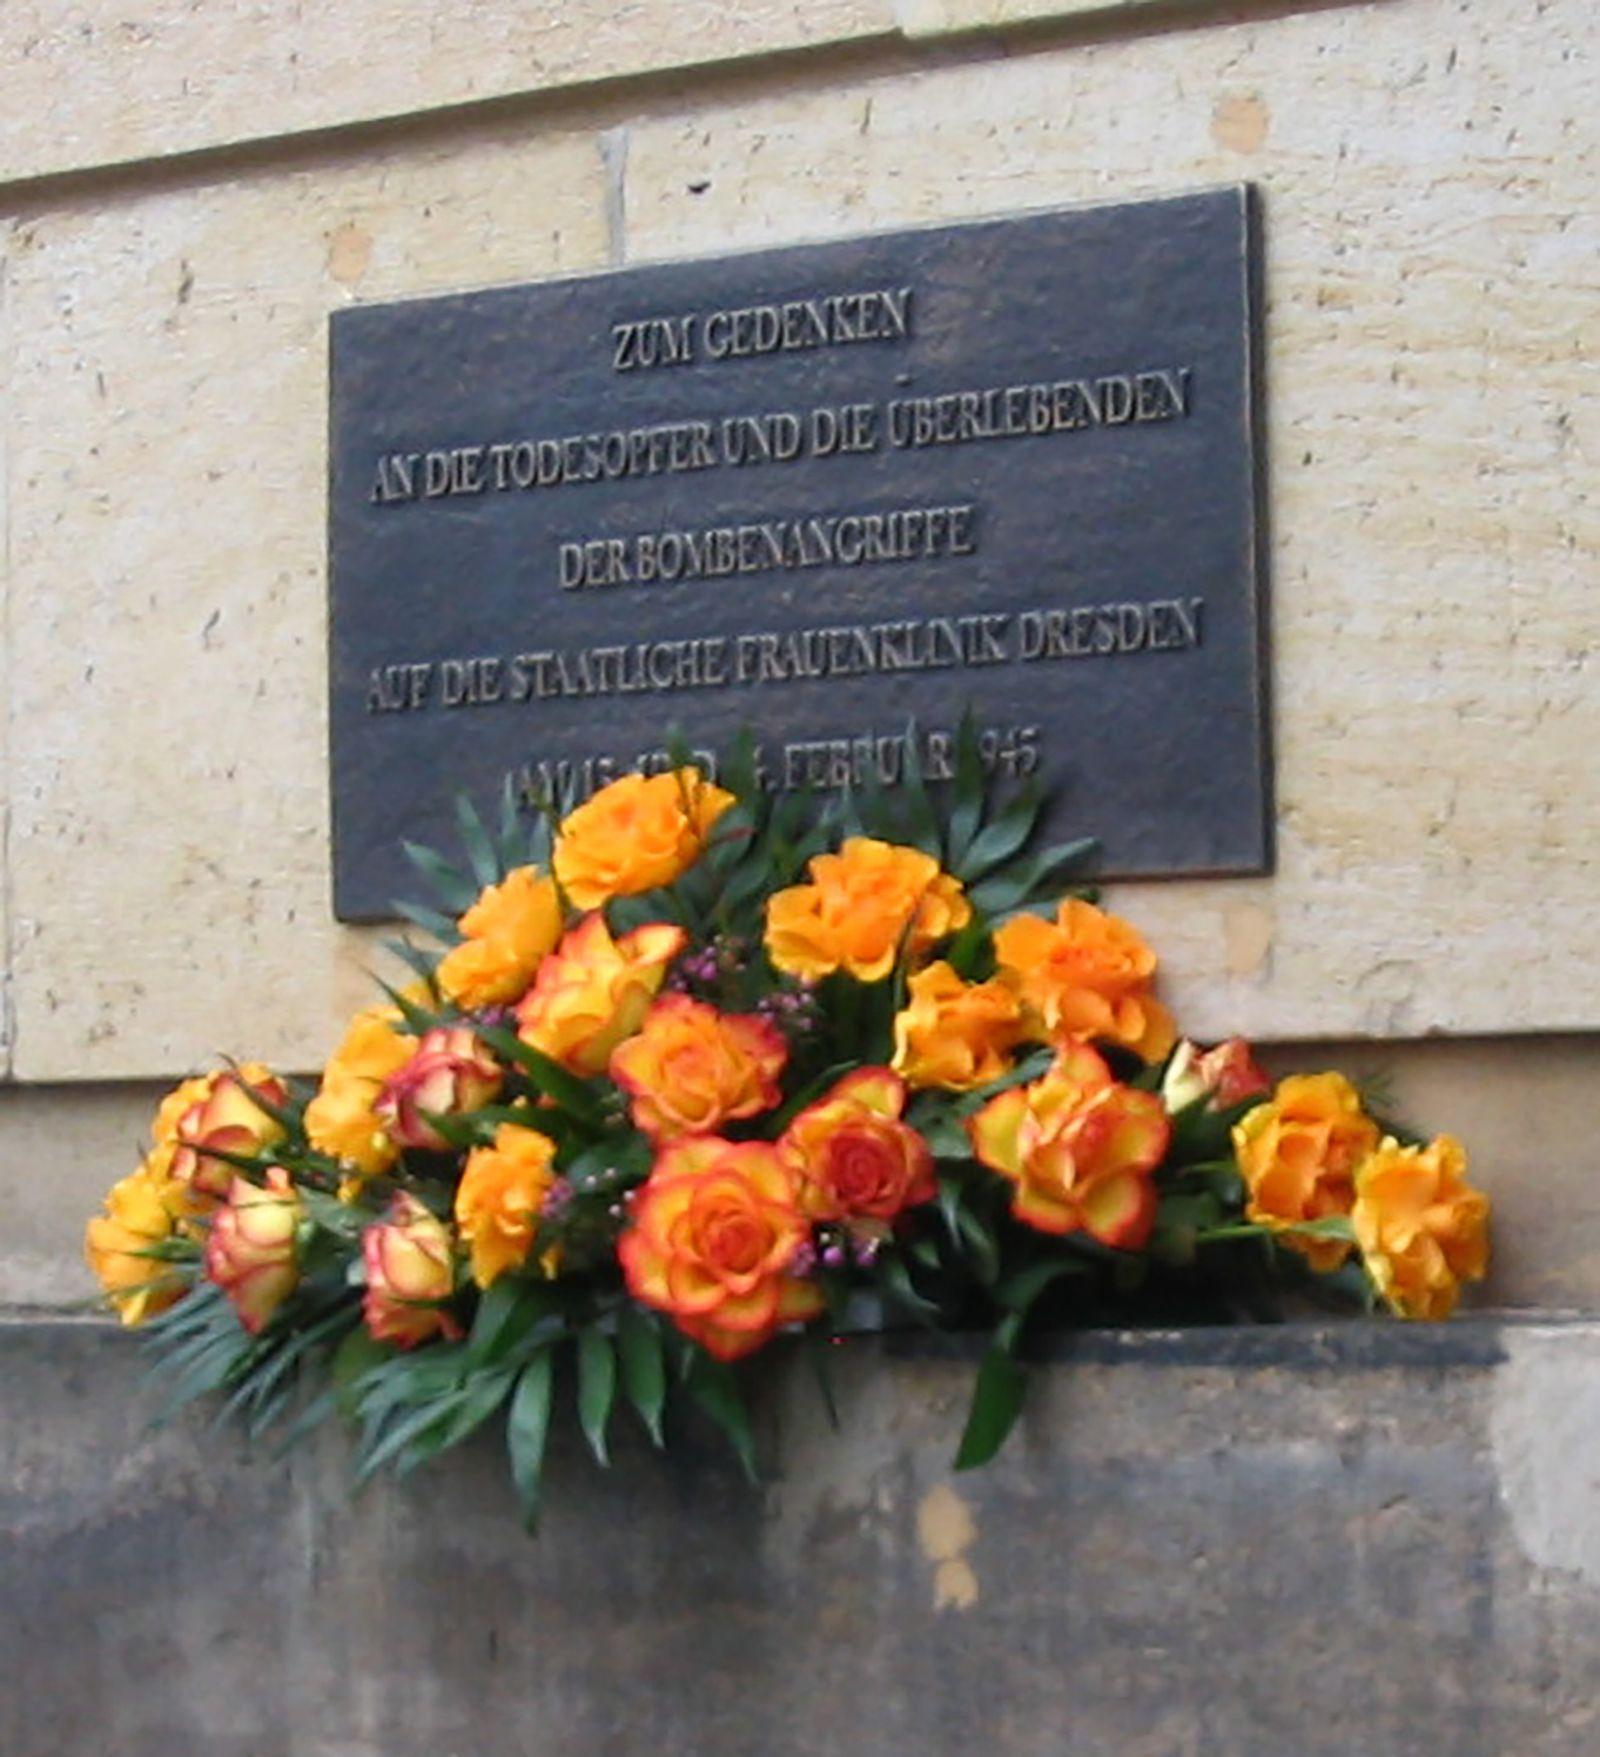 Bombardierung Dresden - Gedenktafel